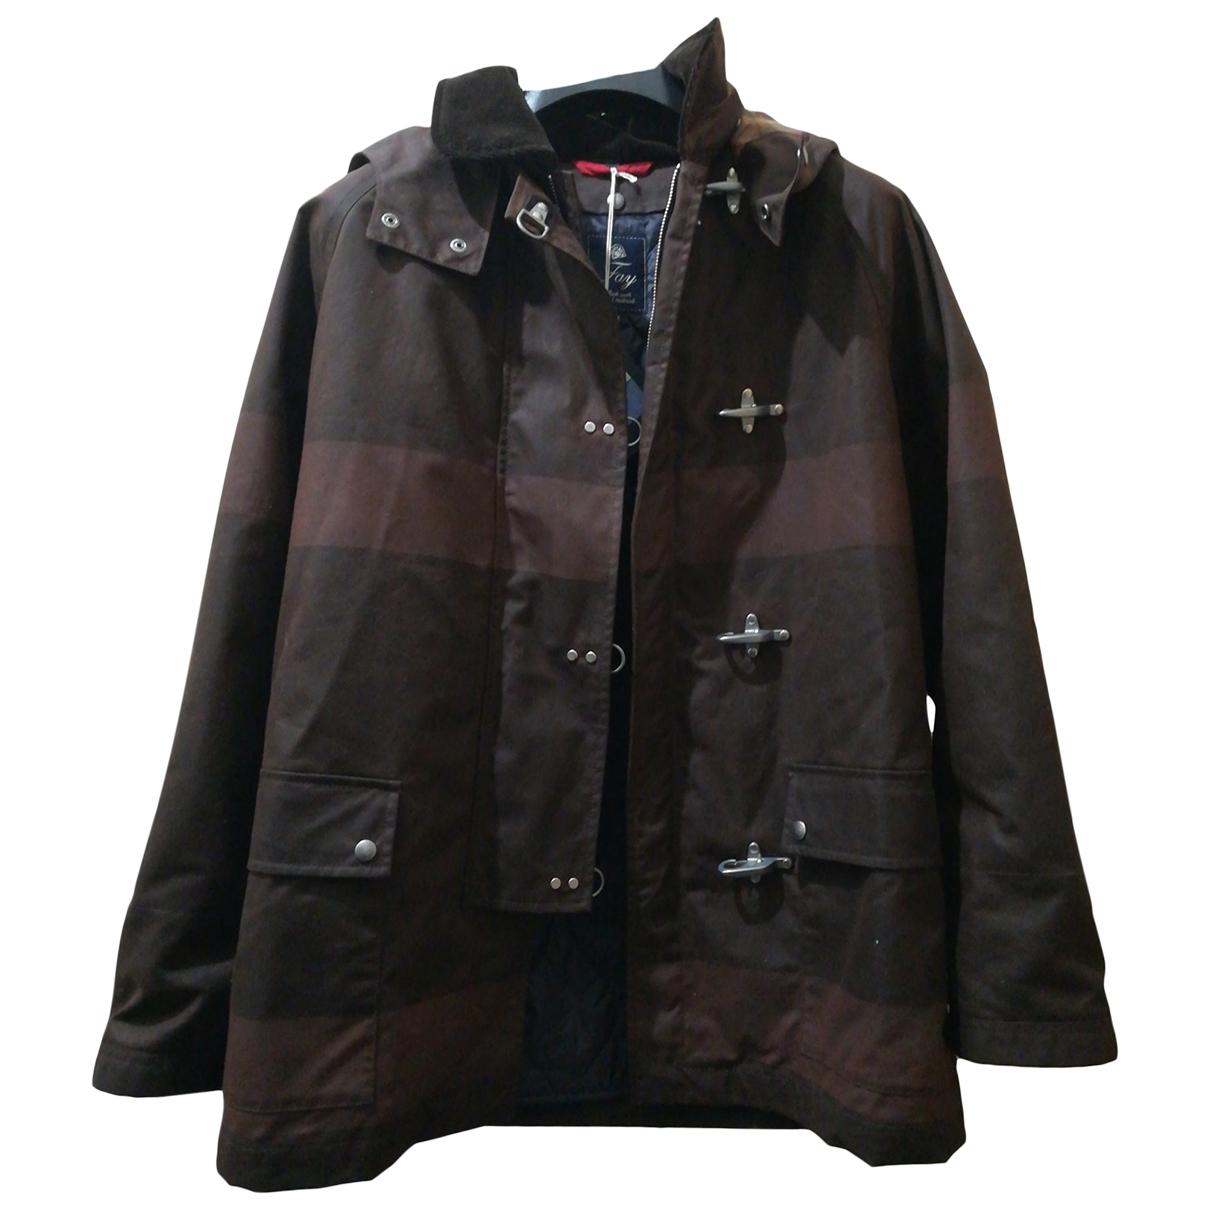 Fay \N Brown Cotton jacket  for Men M International